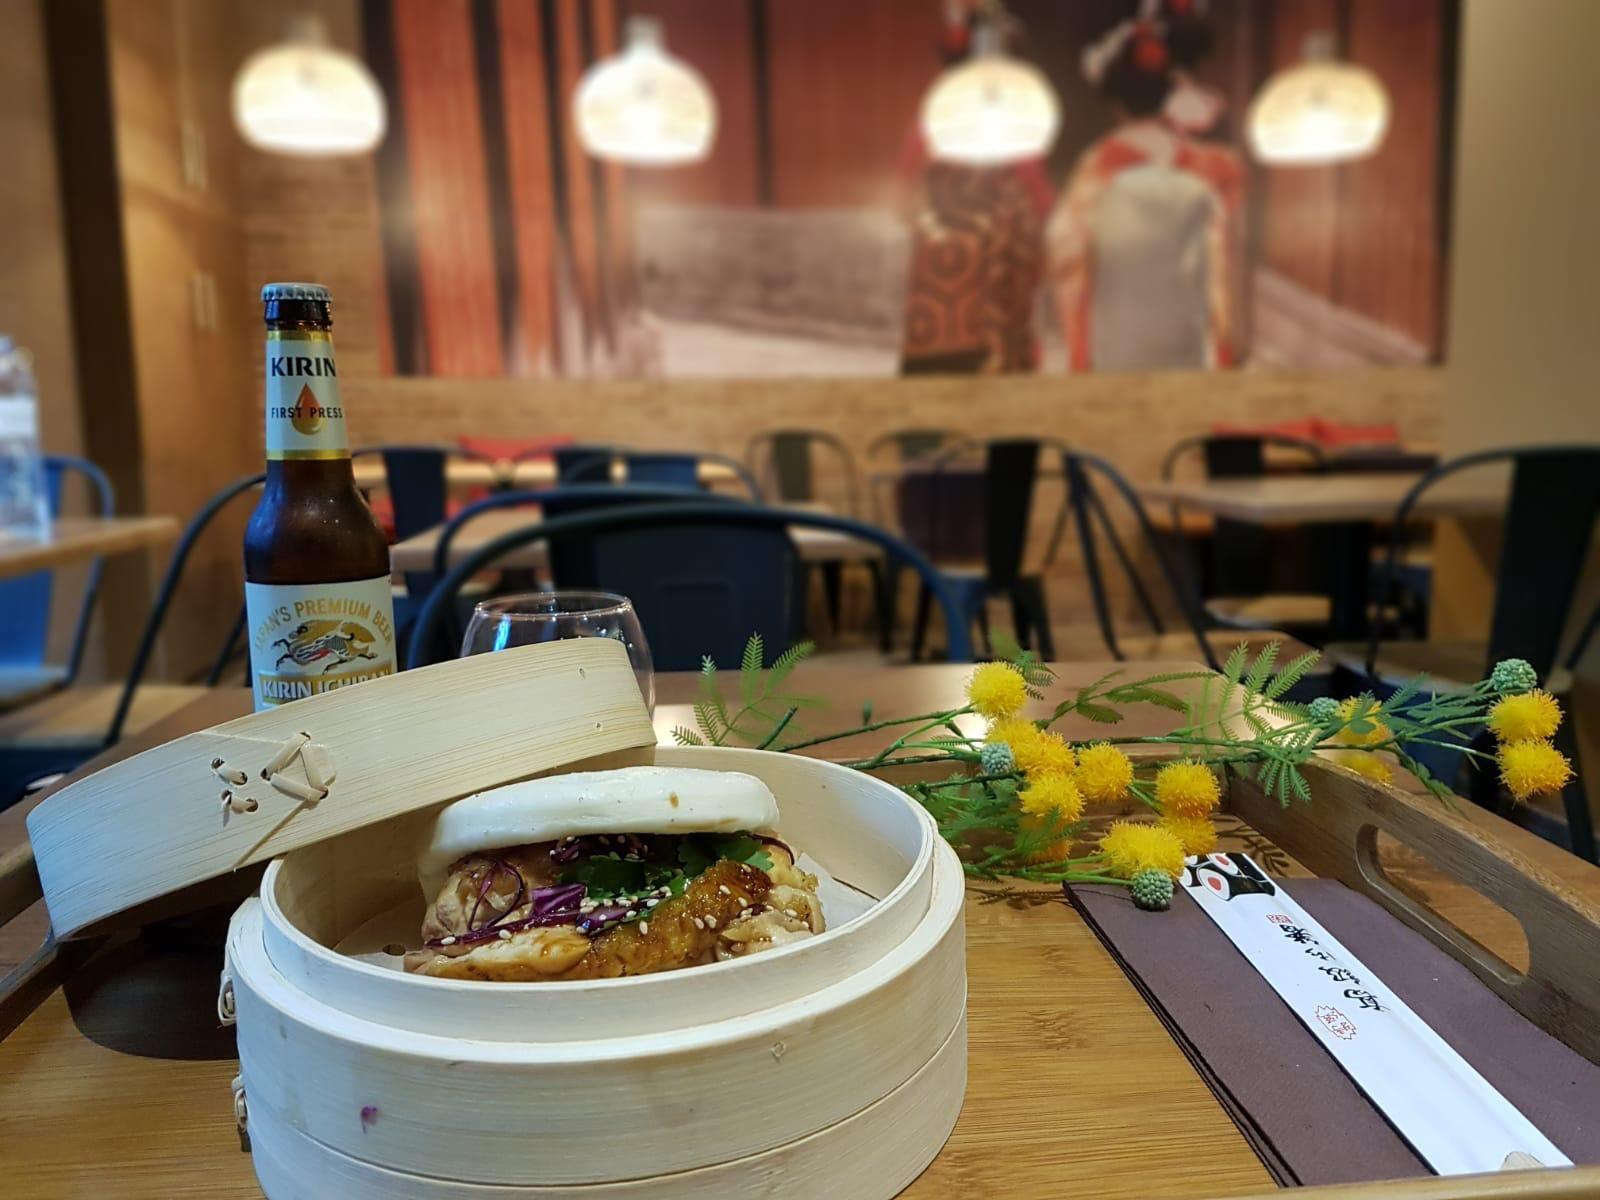 Comida asiática en Poblenou arcelona